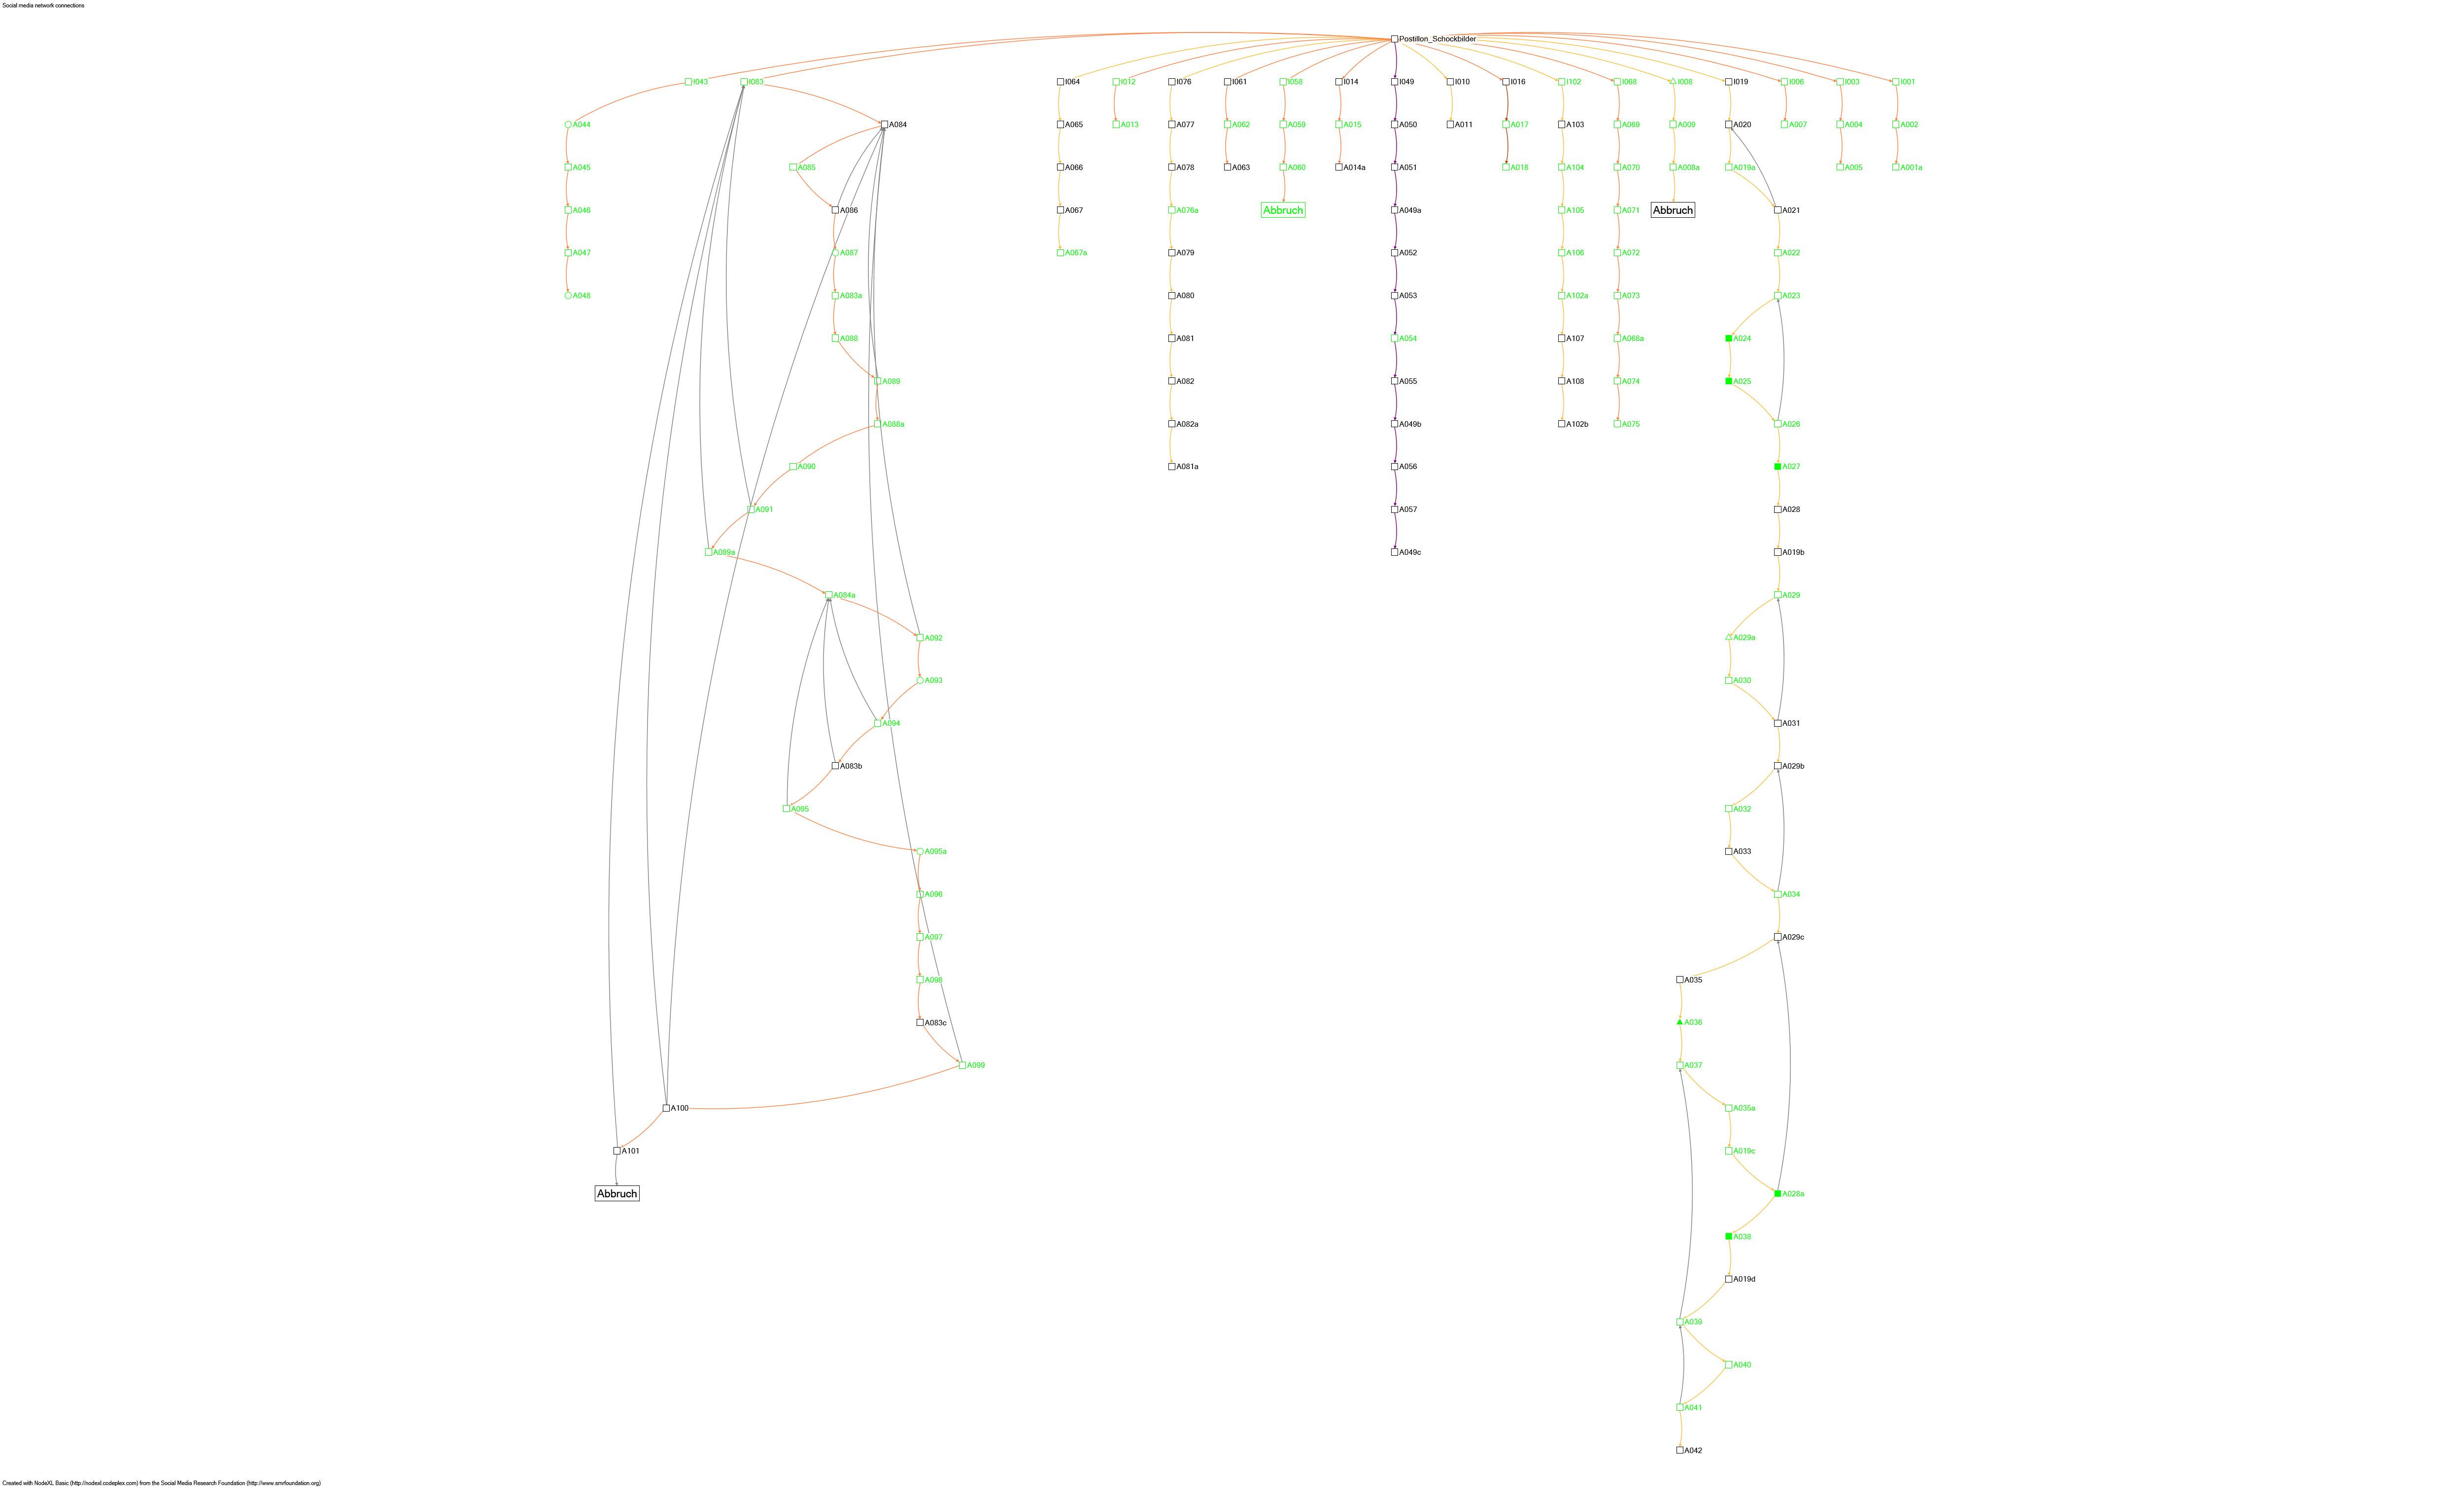 Abbildung_14_Postillon_Schockbilder